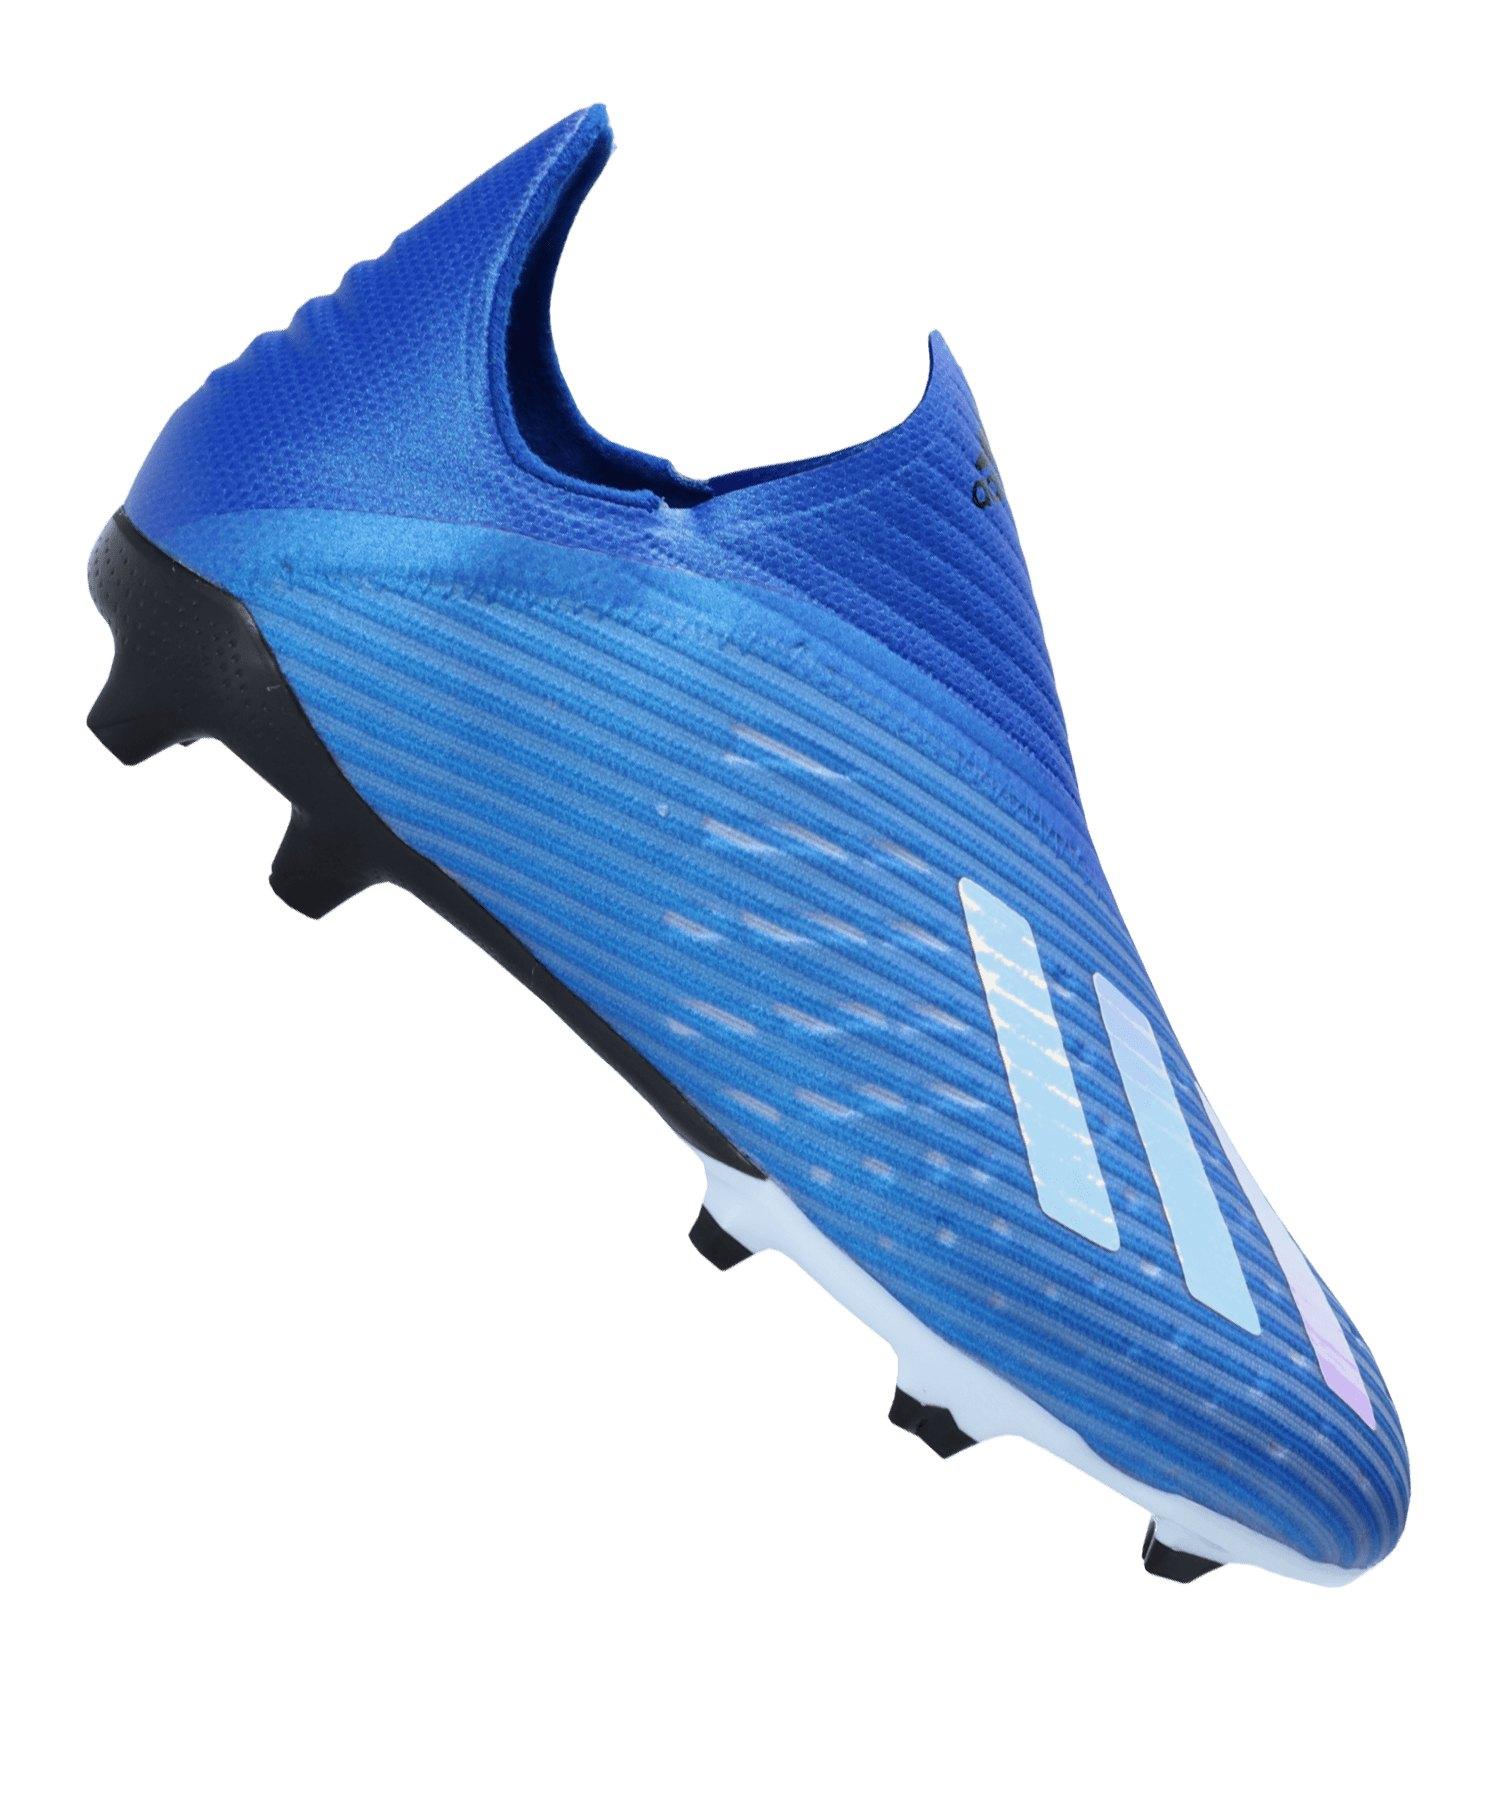 adidas X 19+ FG J Kids Blau Weiss Schwarz - blau